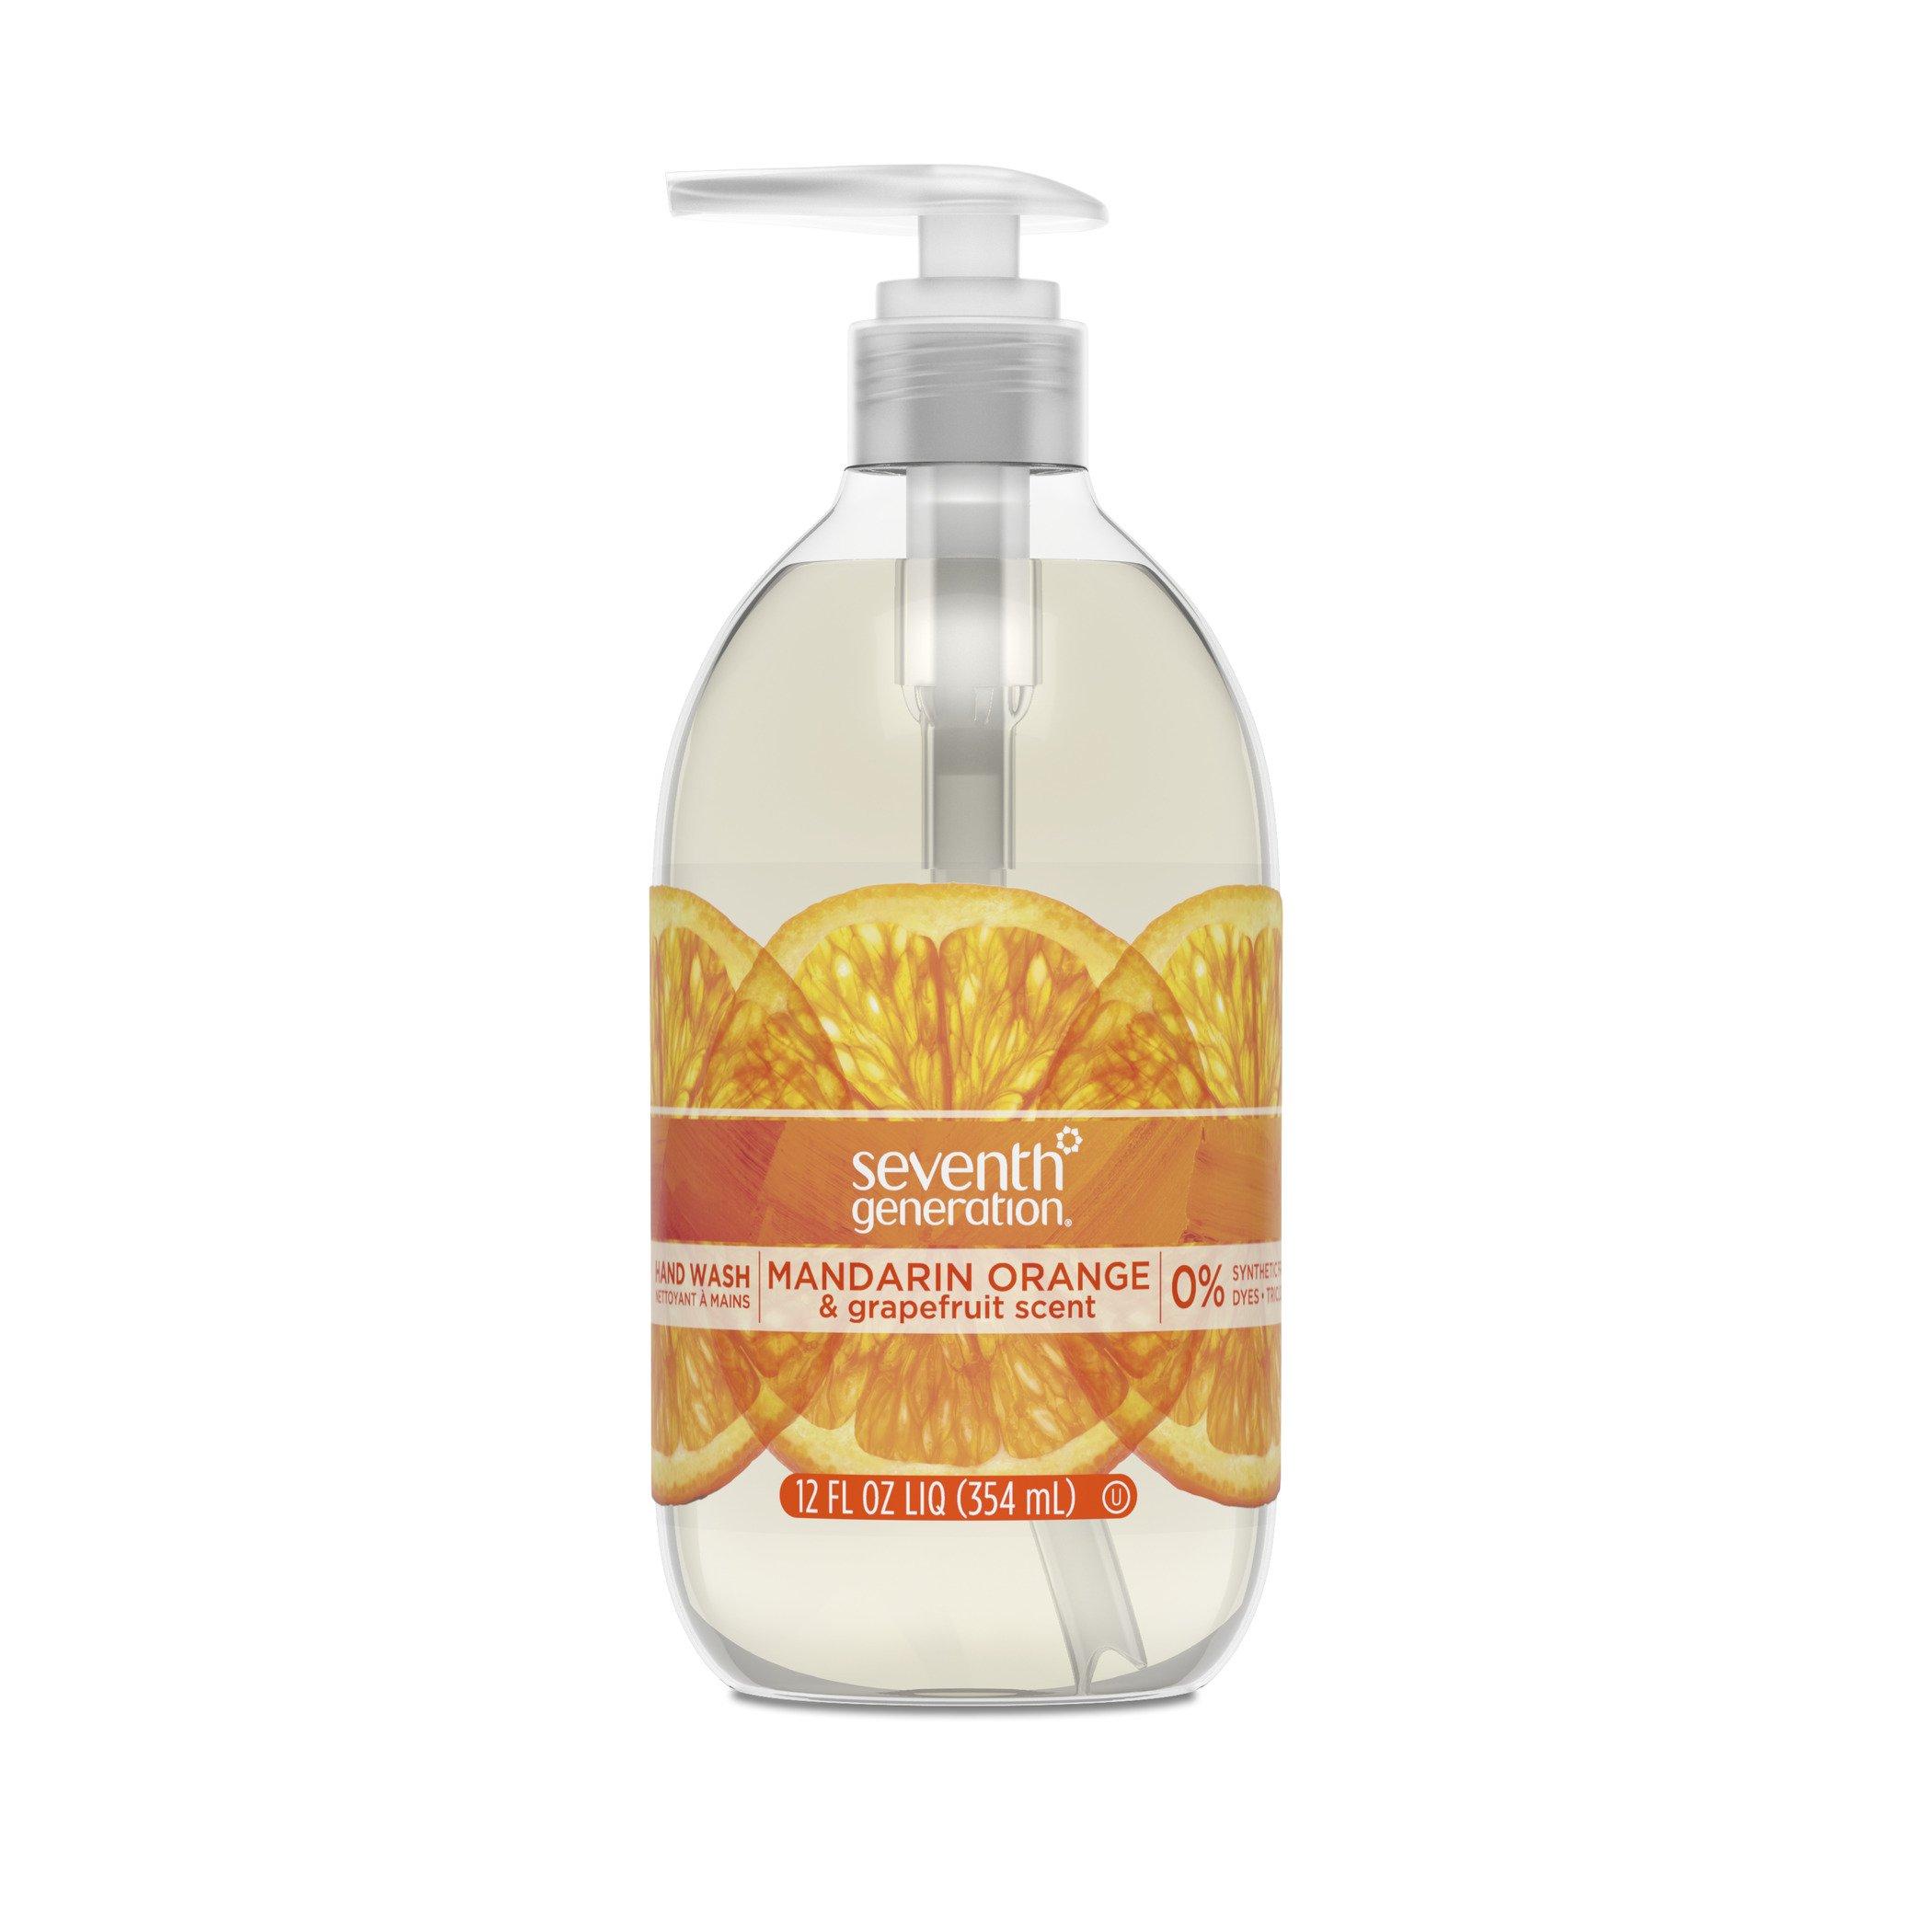 Seventh Generation Hand Wash Soap, Mandarin Orange & Grapefruit, 12 Fl Oz, (Pack of 8)